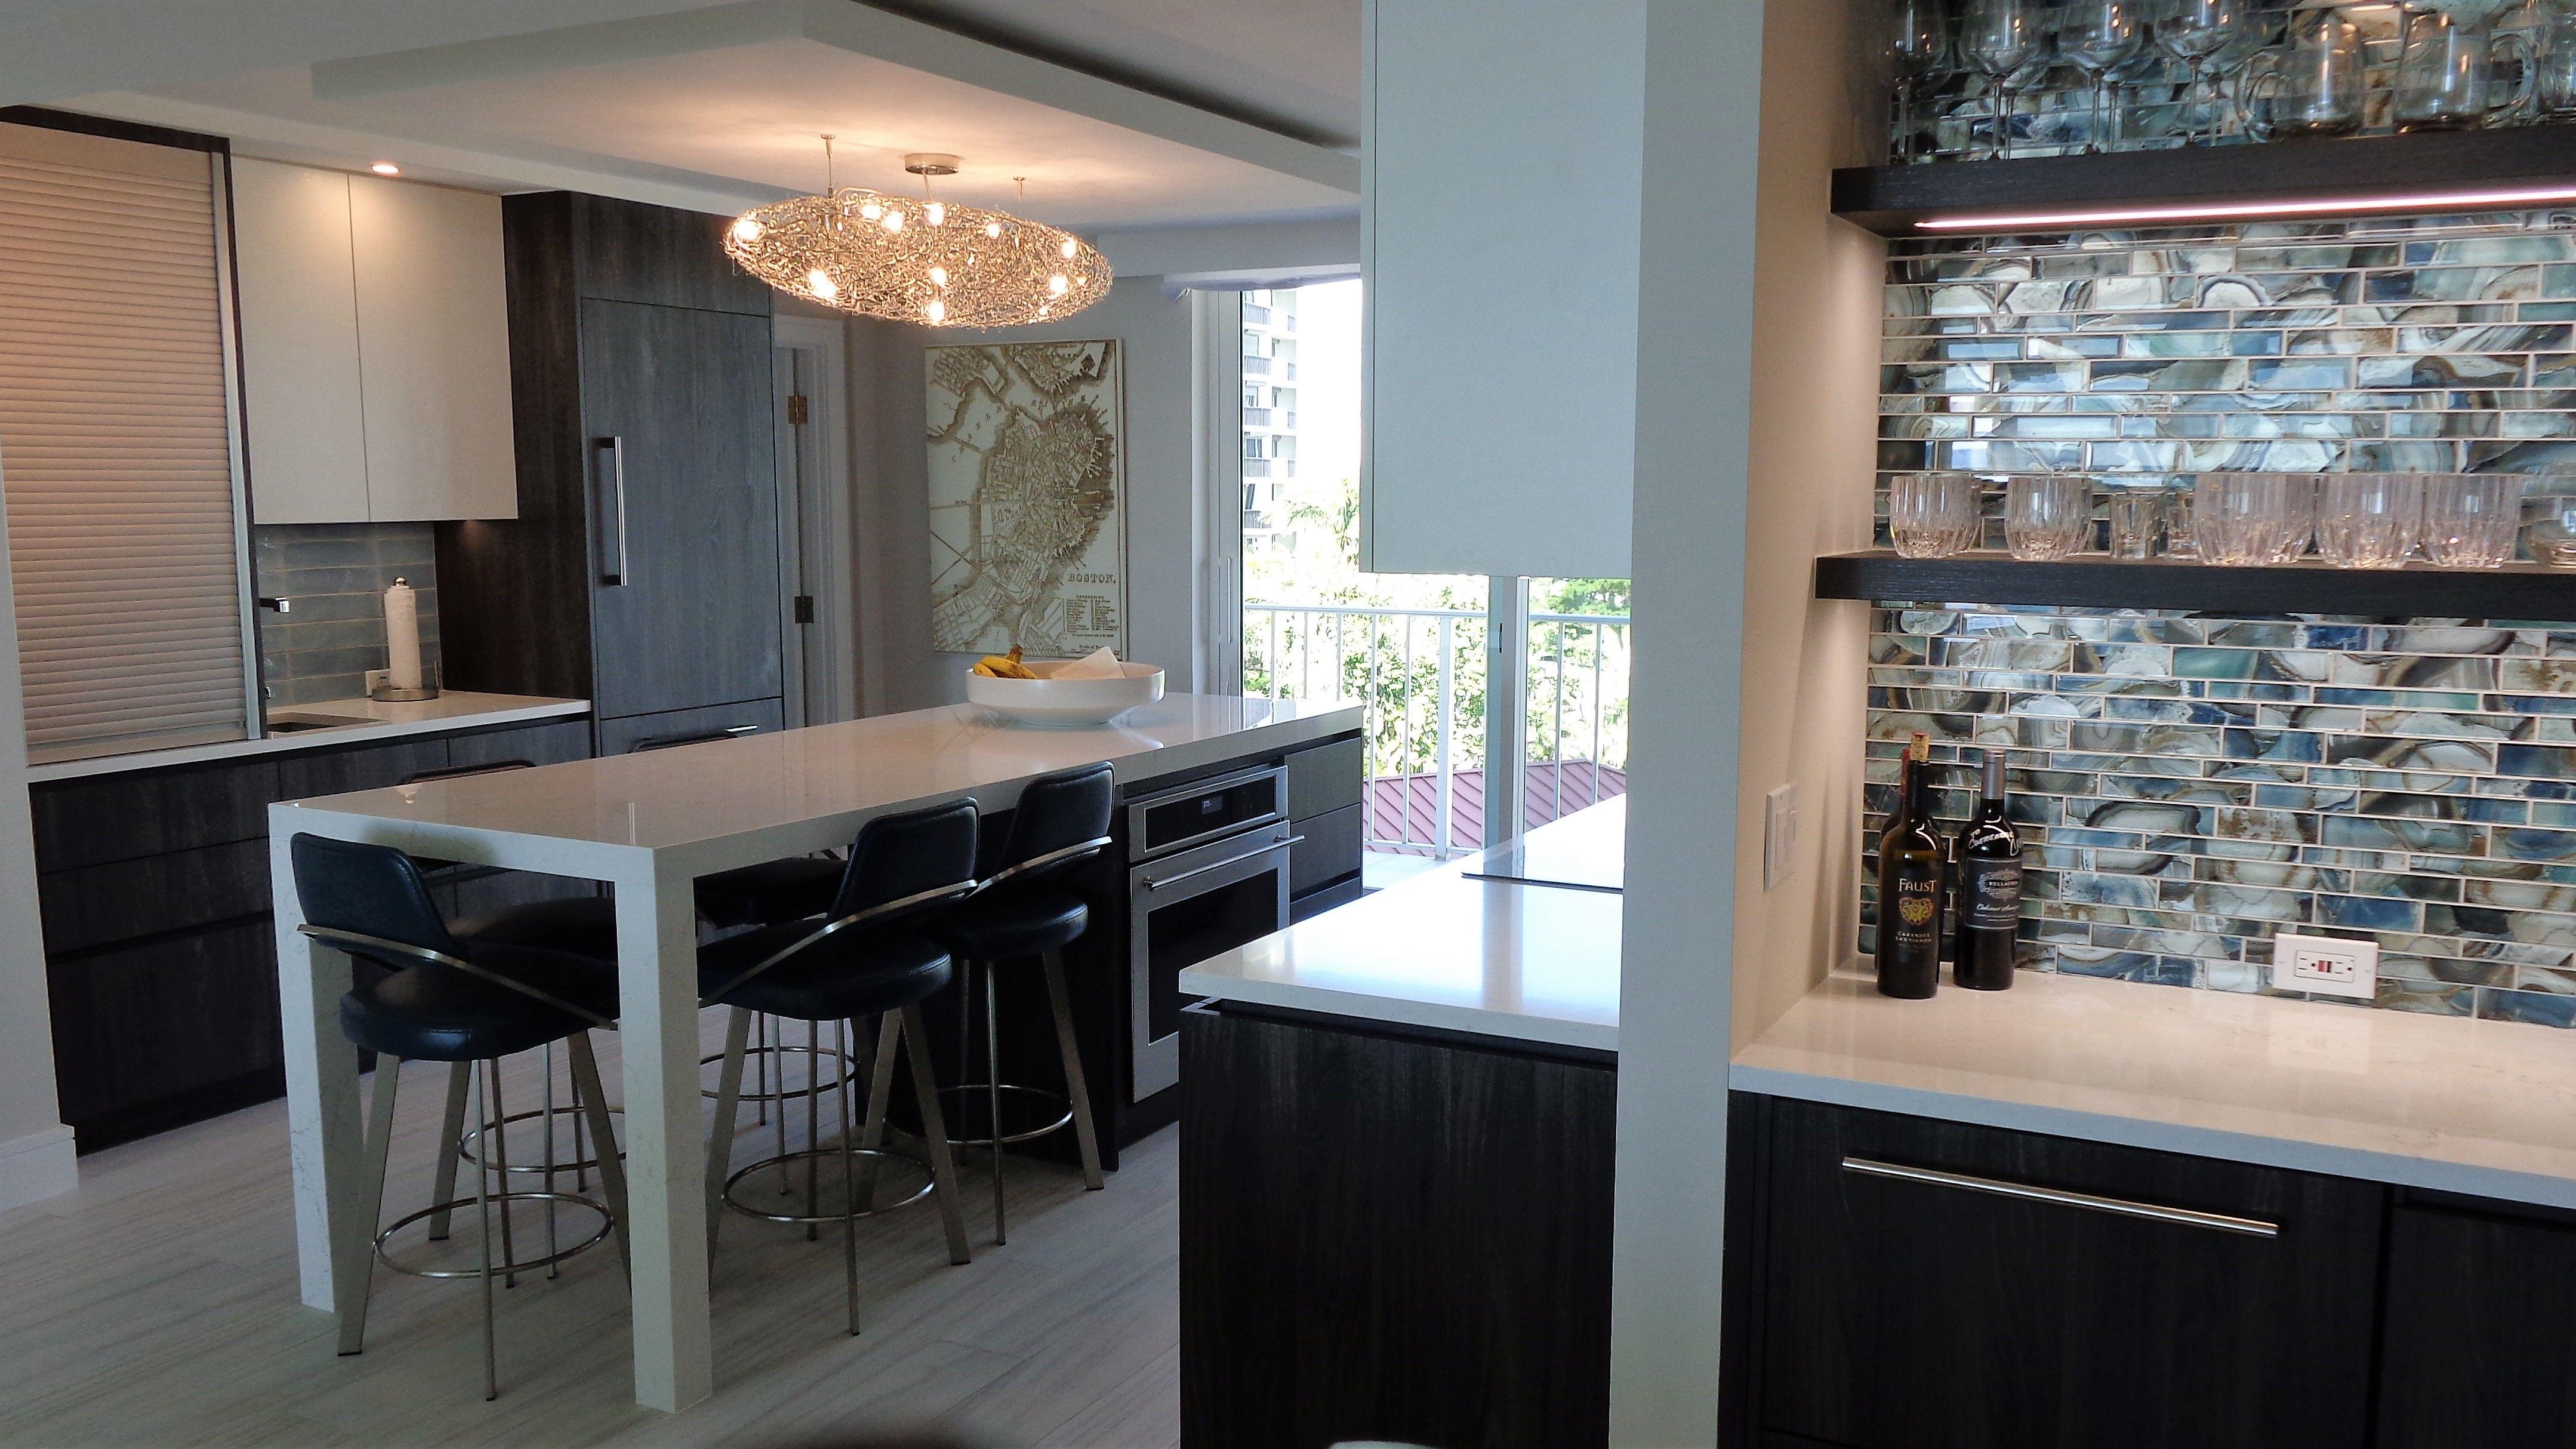 Naples Florida Contemporary Kitchens Designs Contemporary Kitchen Design Kitchen Cabinet Remodel Kitchen Remodel